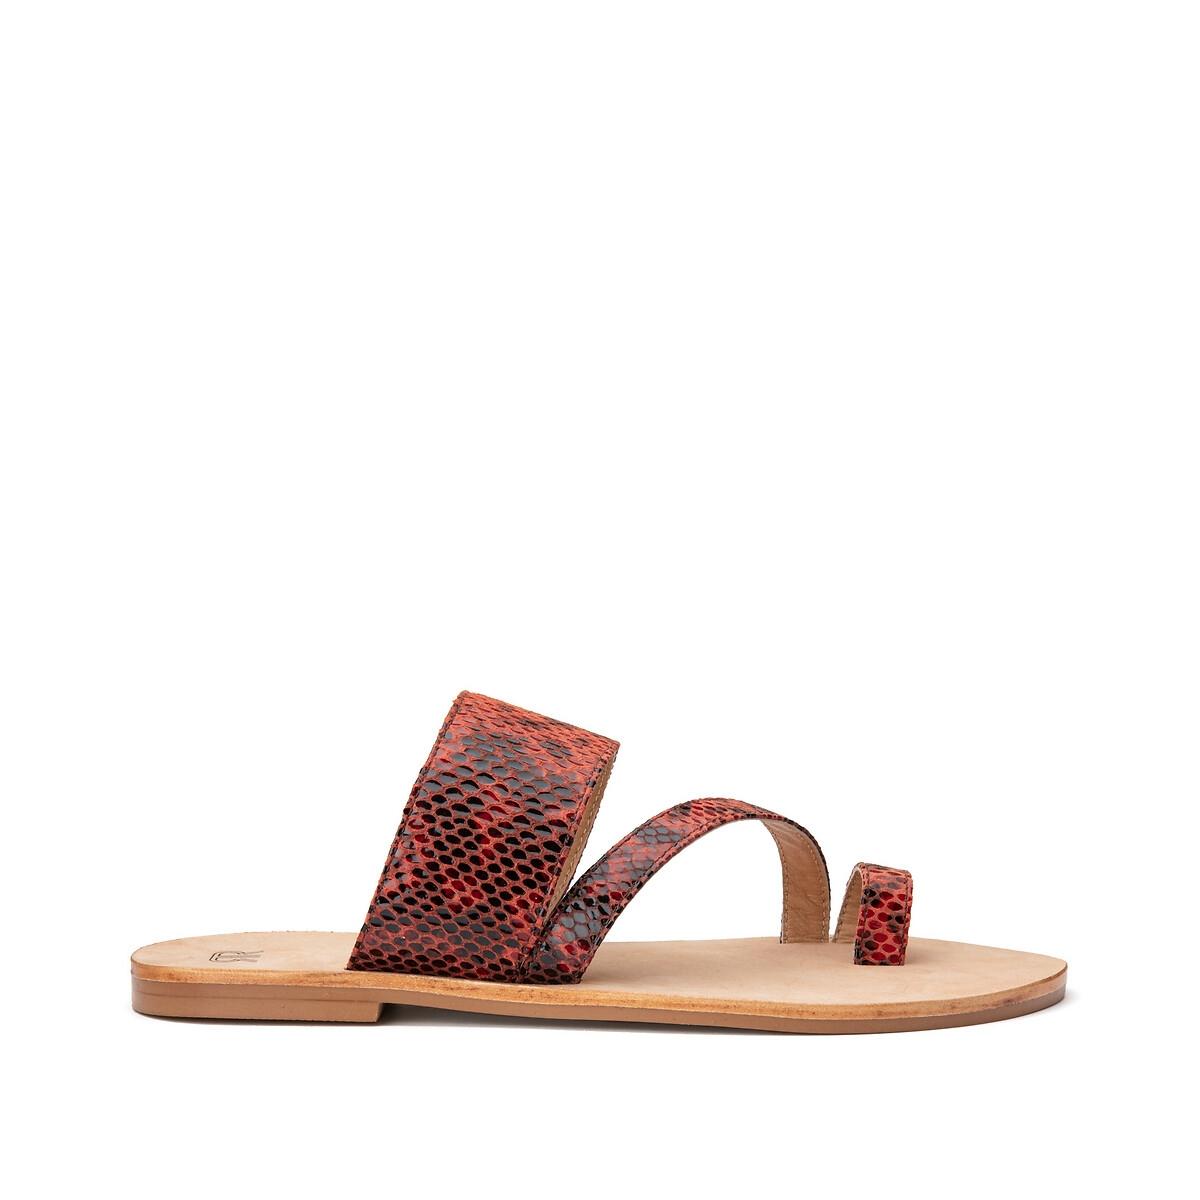 Туфли LaRedoute Без задника из кожи с питоновым принтом 40 оранжевый ботинки laredoute из кожи на широком каблуке с питоновым принтом 39 бежевый